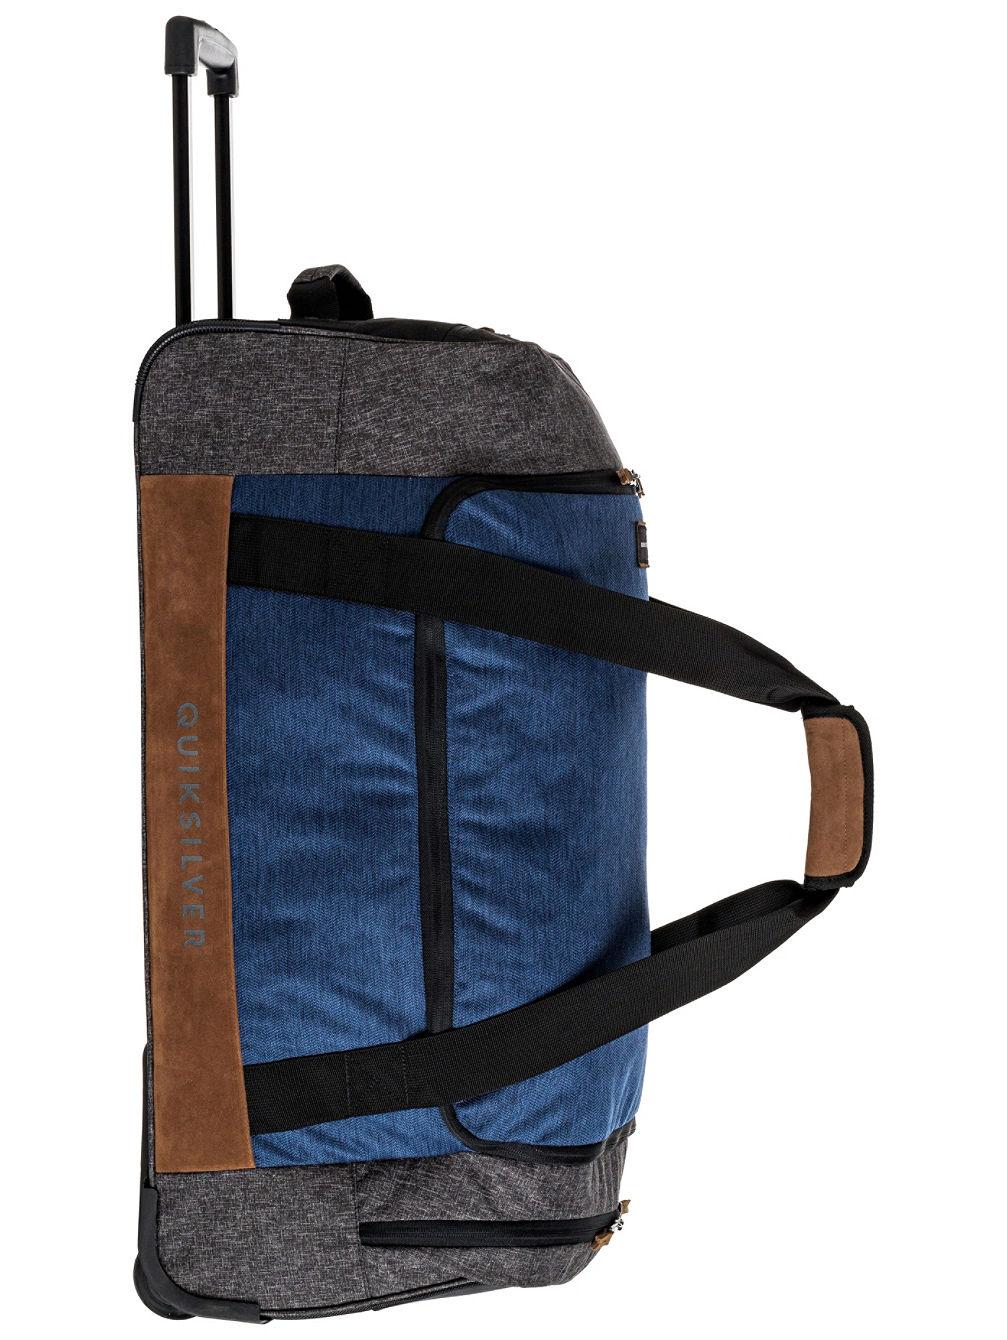 Buy Quiksilver Centurion Travelbag online at blue-tomato.com 781b52a6dfd11